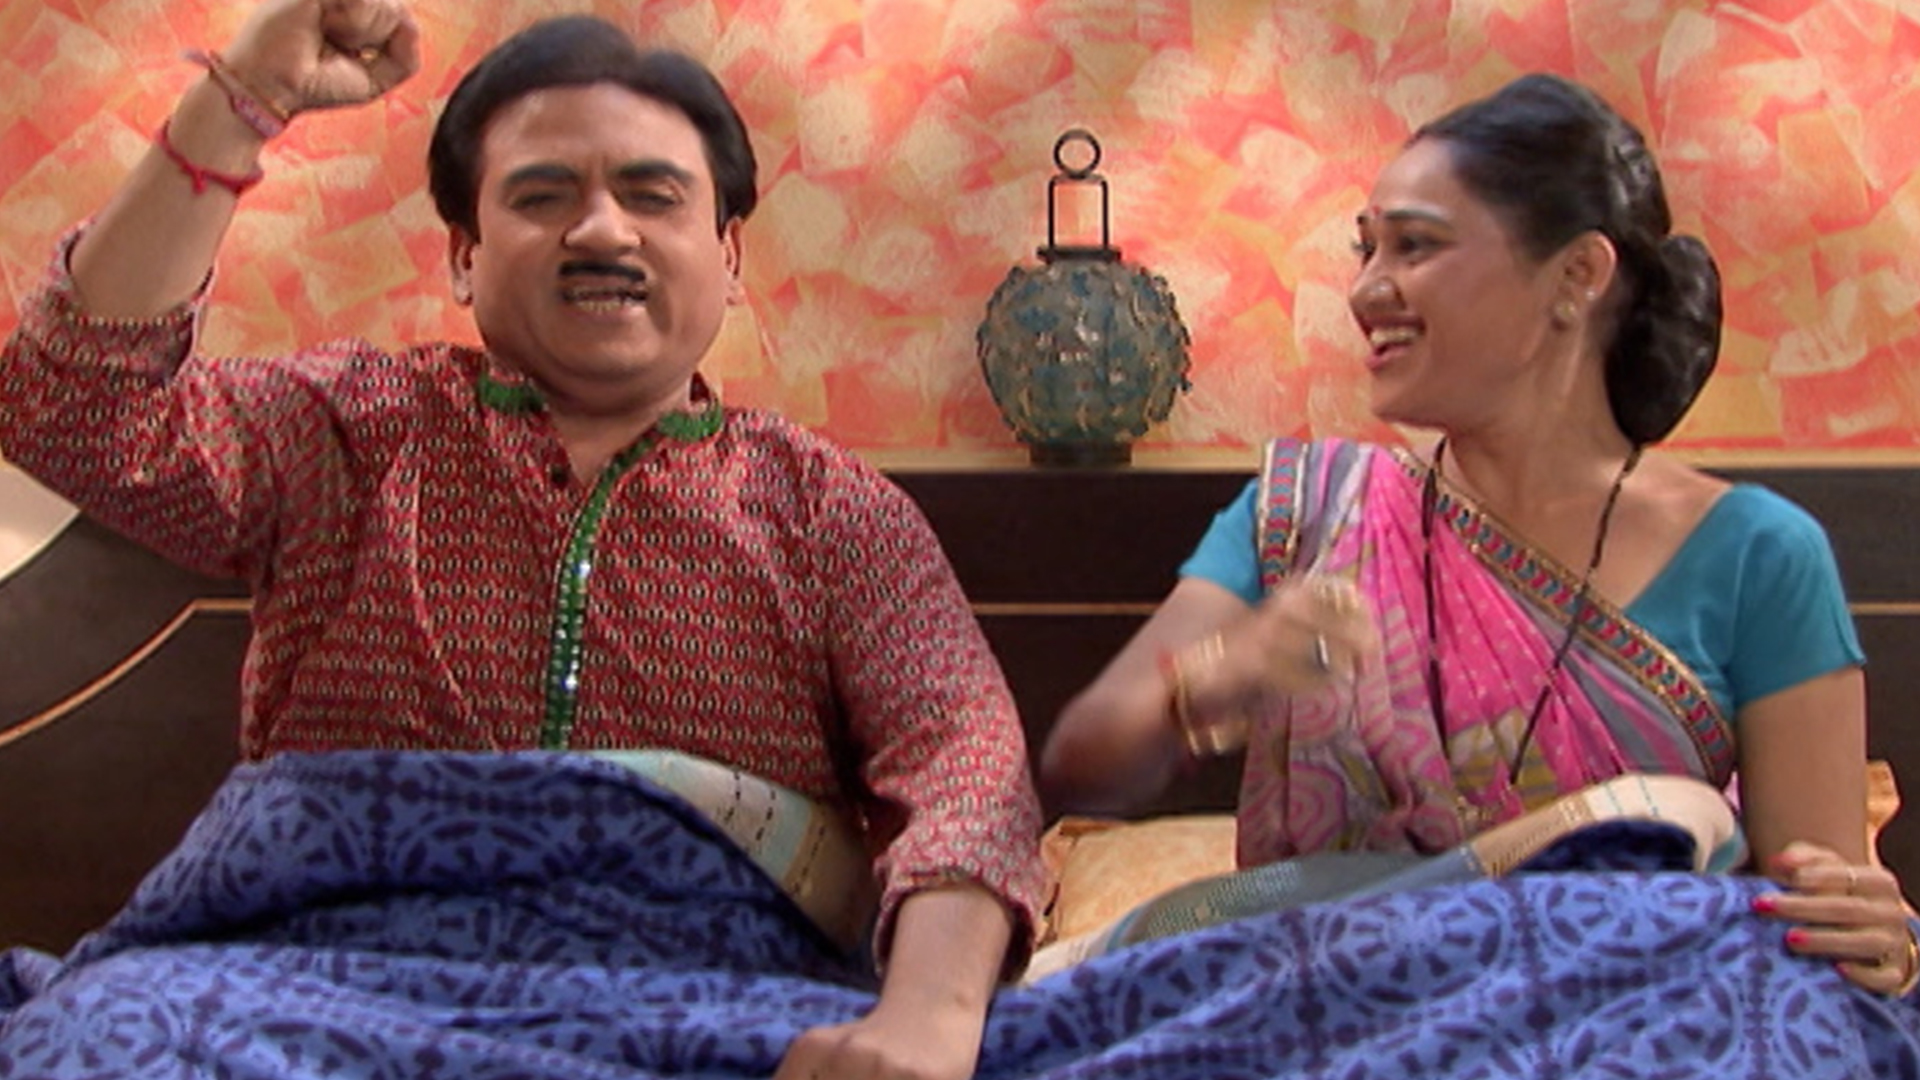 Taarak Mehta Ka Ooltah Chashmah: Episode No. 1717 - Khare